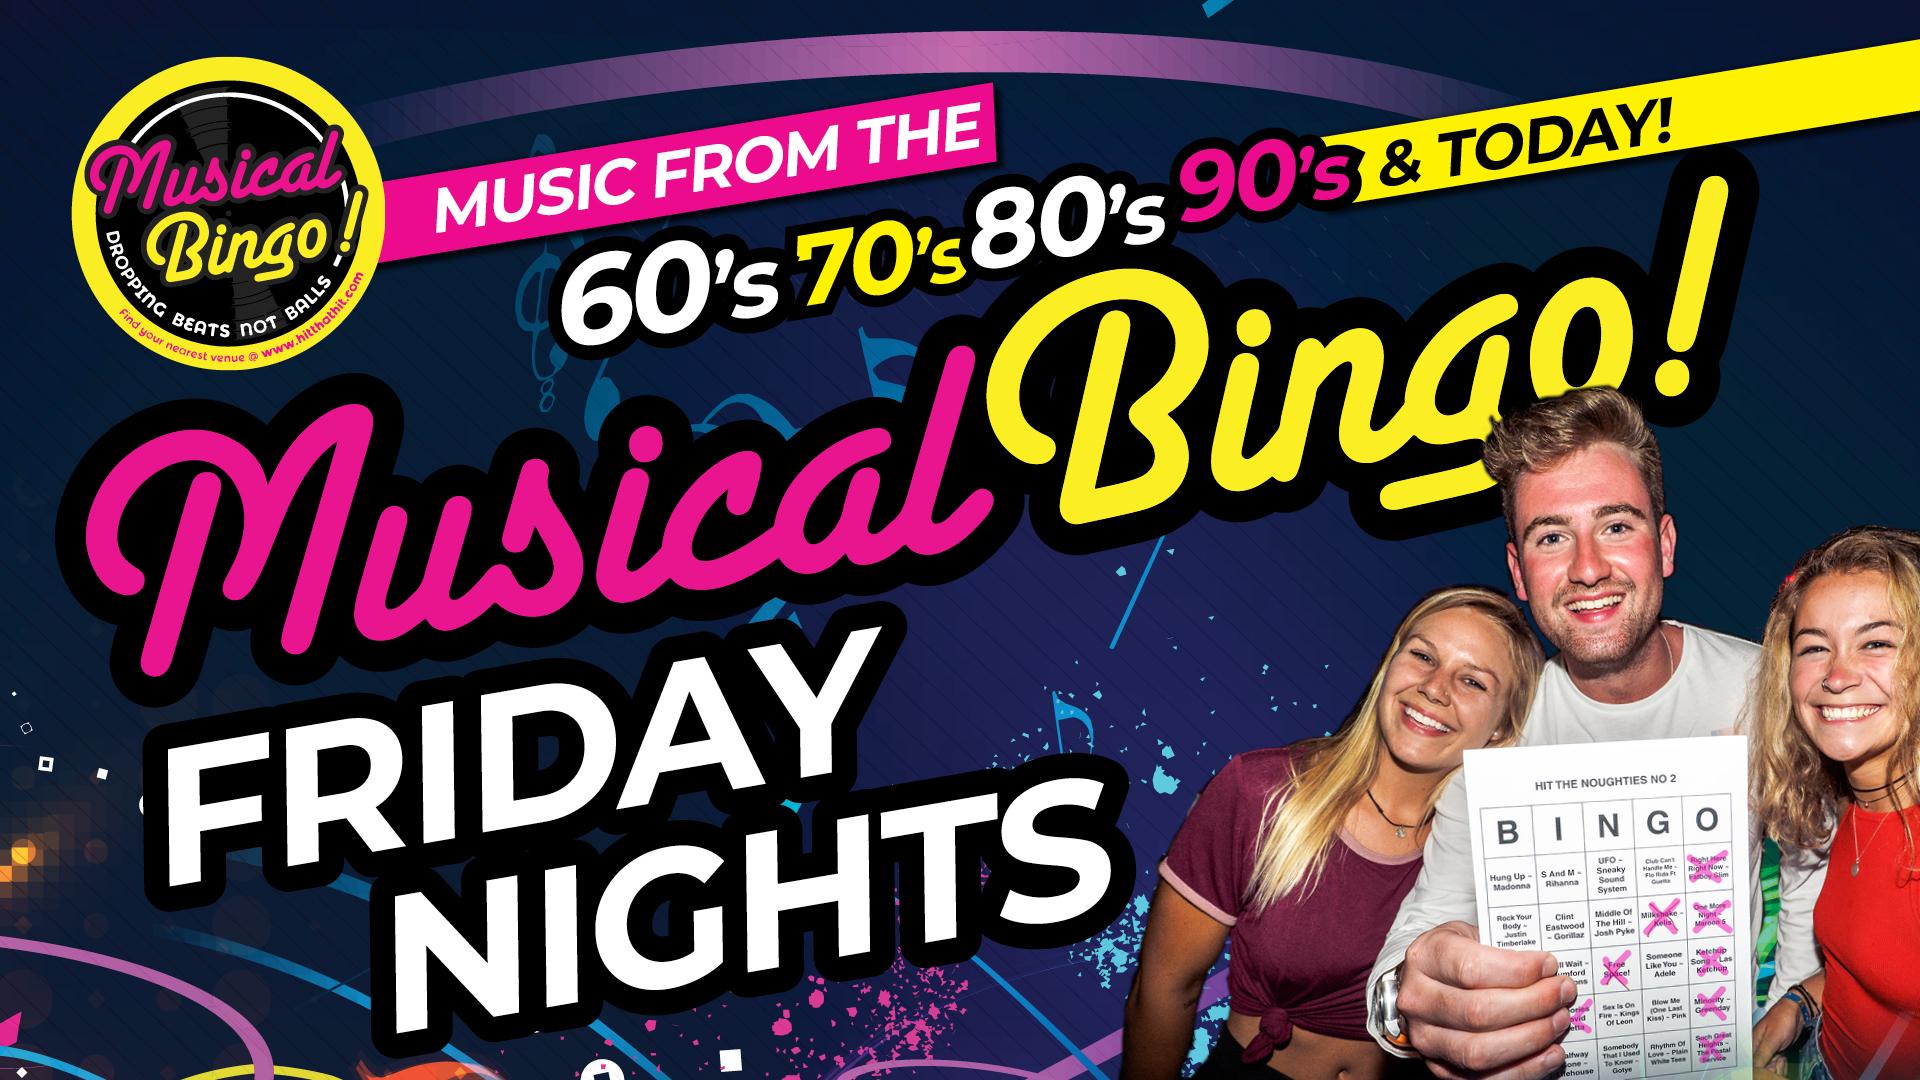 Musical Bingo Nightlife Graphic - Friday.jpg